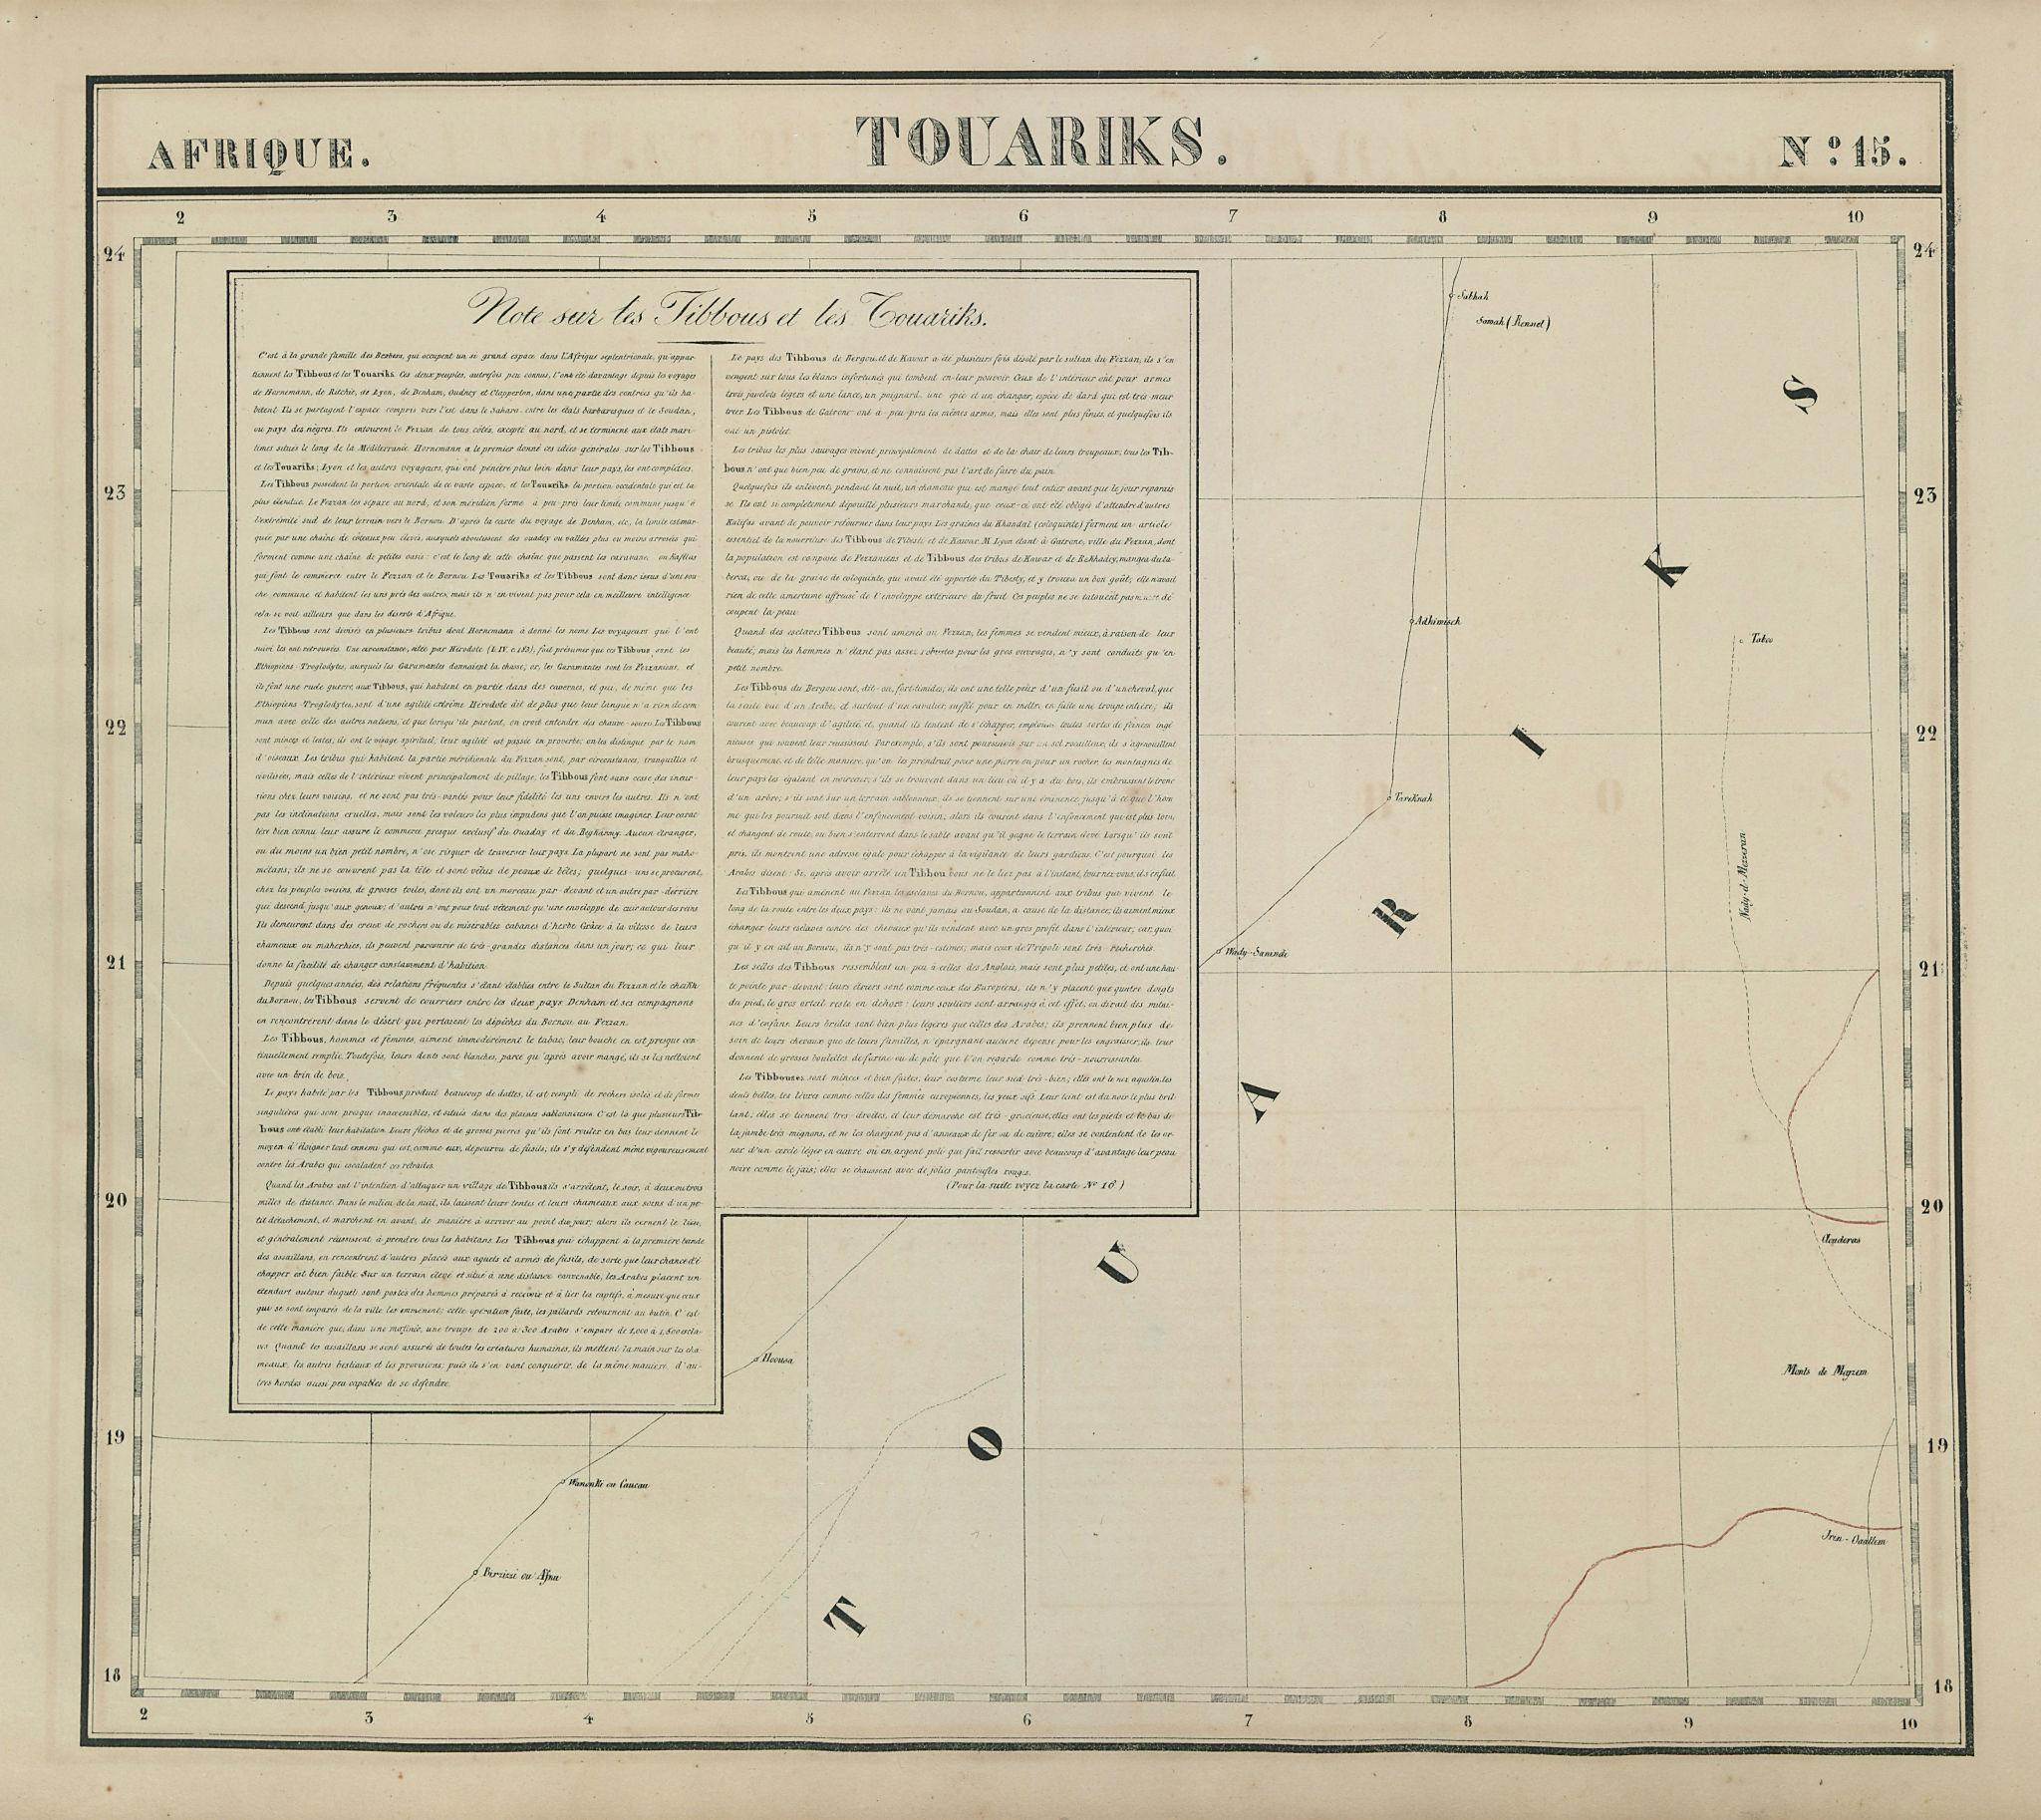 Afrique. Touariks #15. Sahara in SE Niger & Northern Niger VANDERMAELEN 1827 map